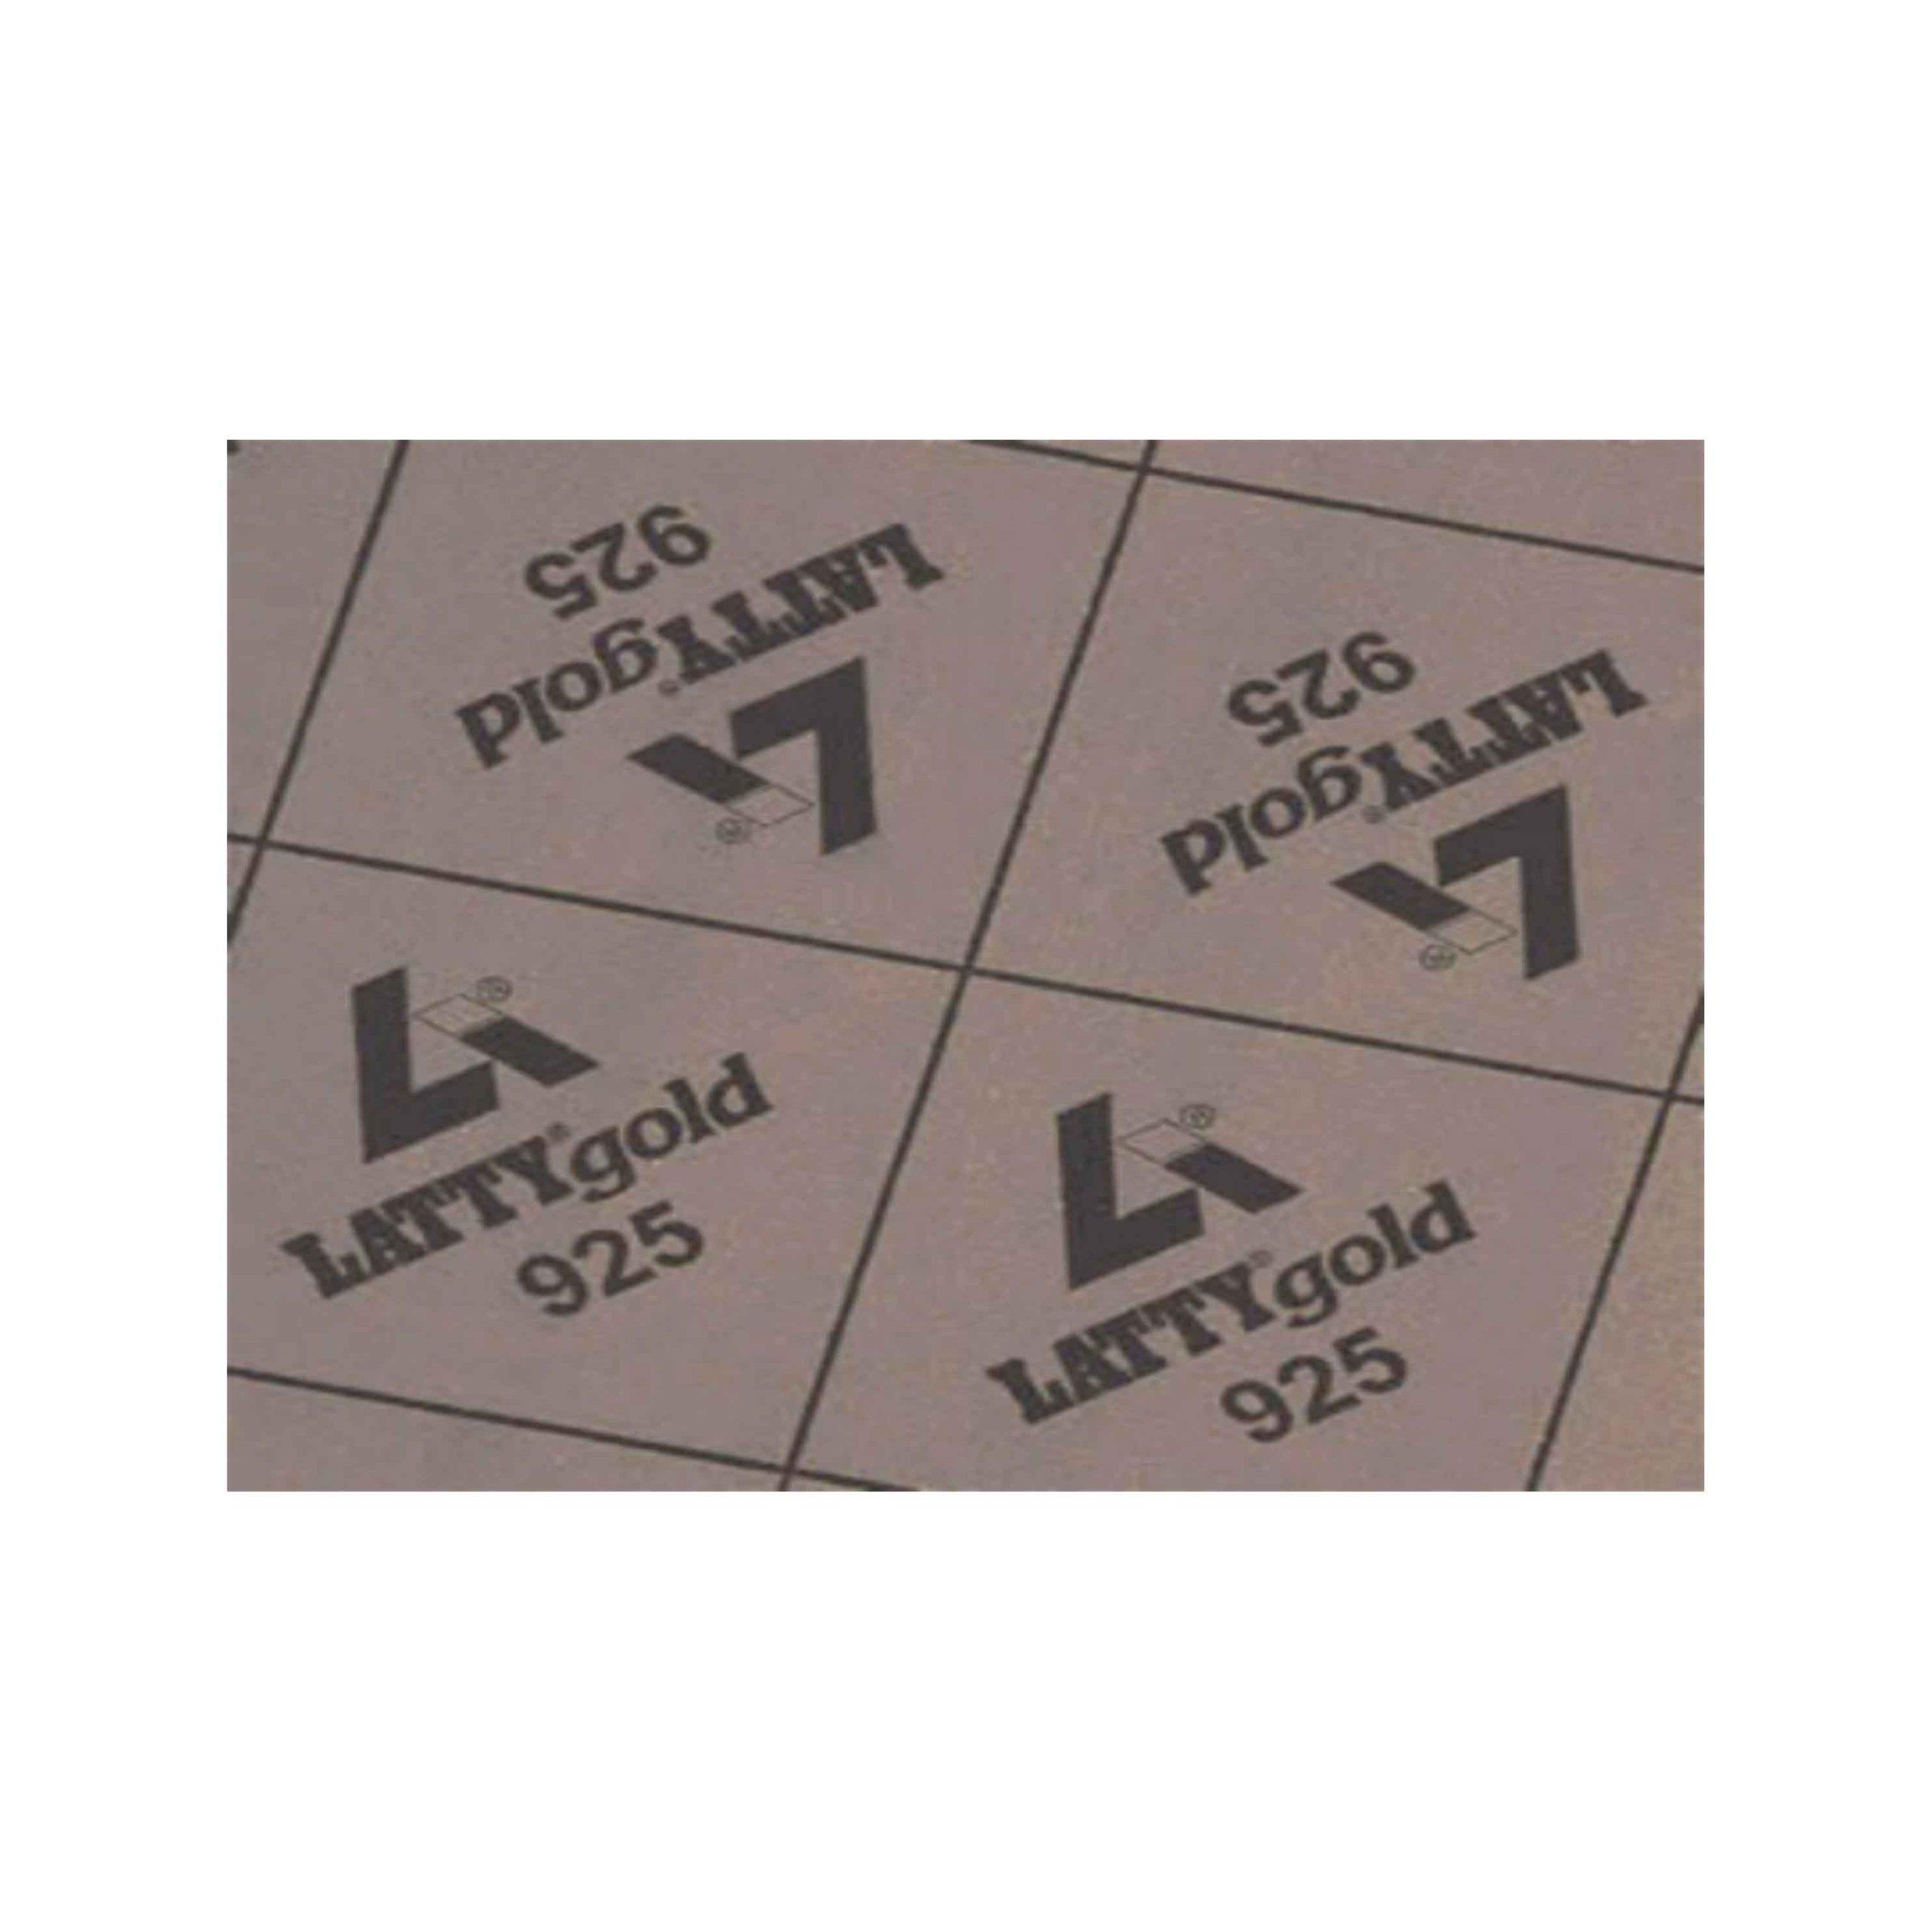 LATTY_GOLD_925_REF_6748_GARNITURES_ETANCHEITE_BSB_CAOUTCHOUCS_PLASTIQUES